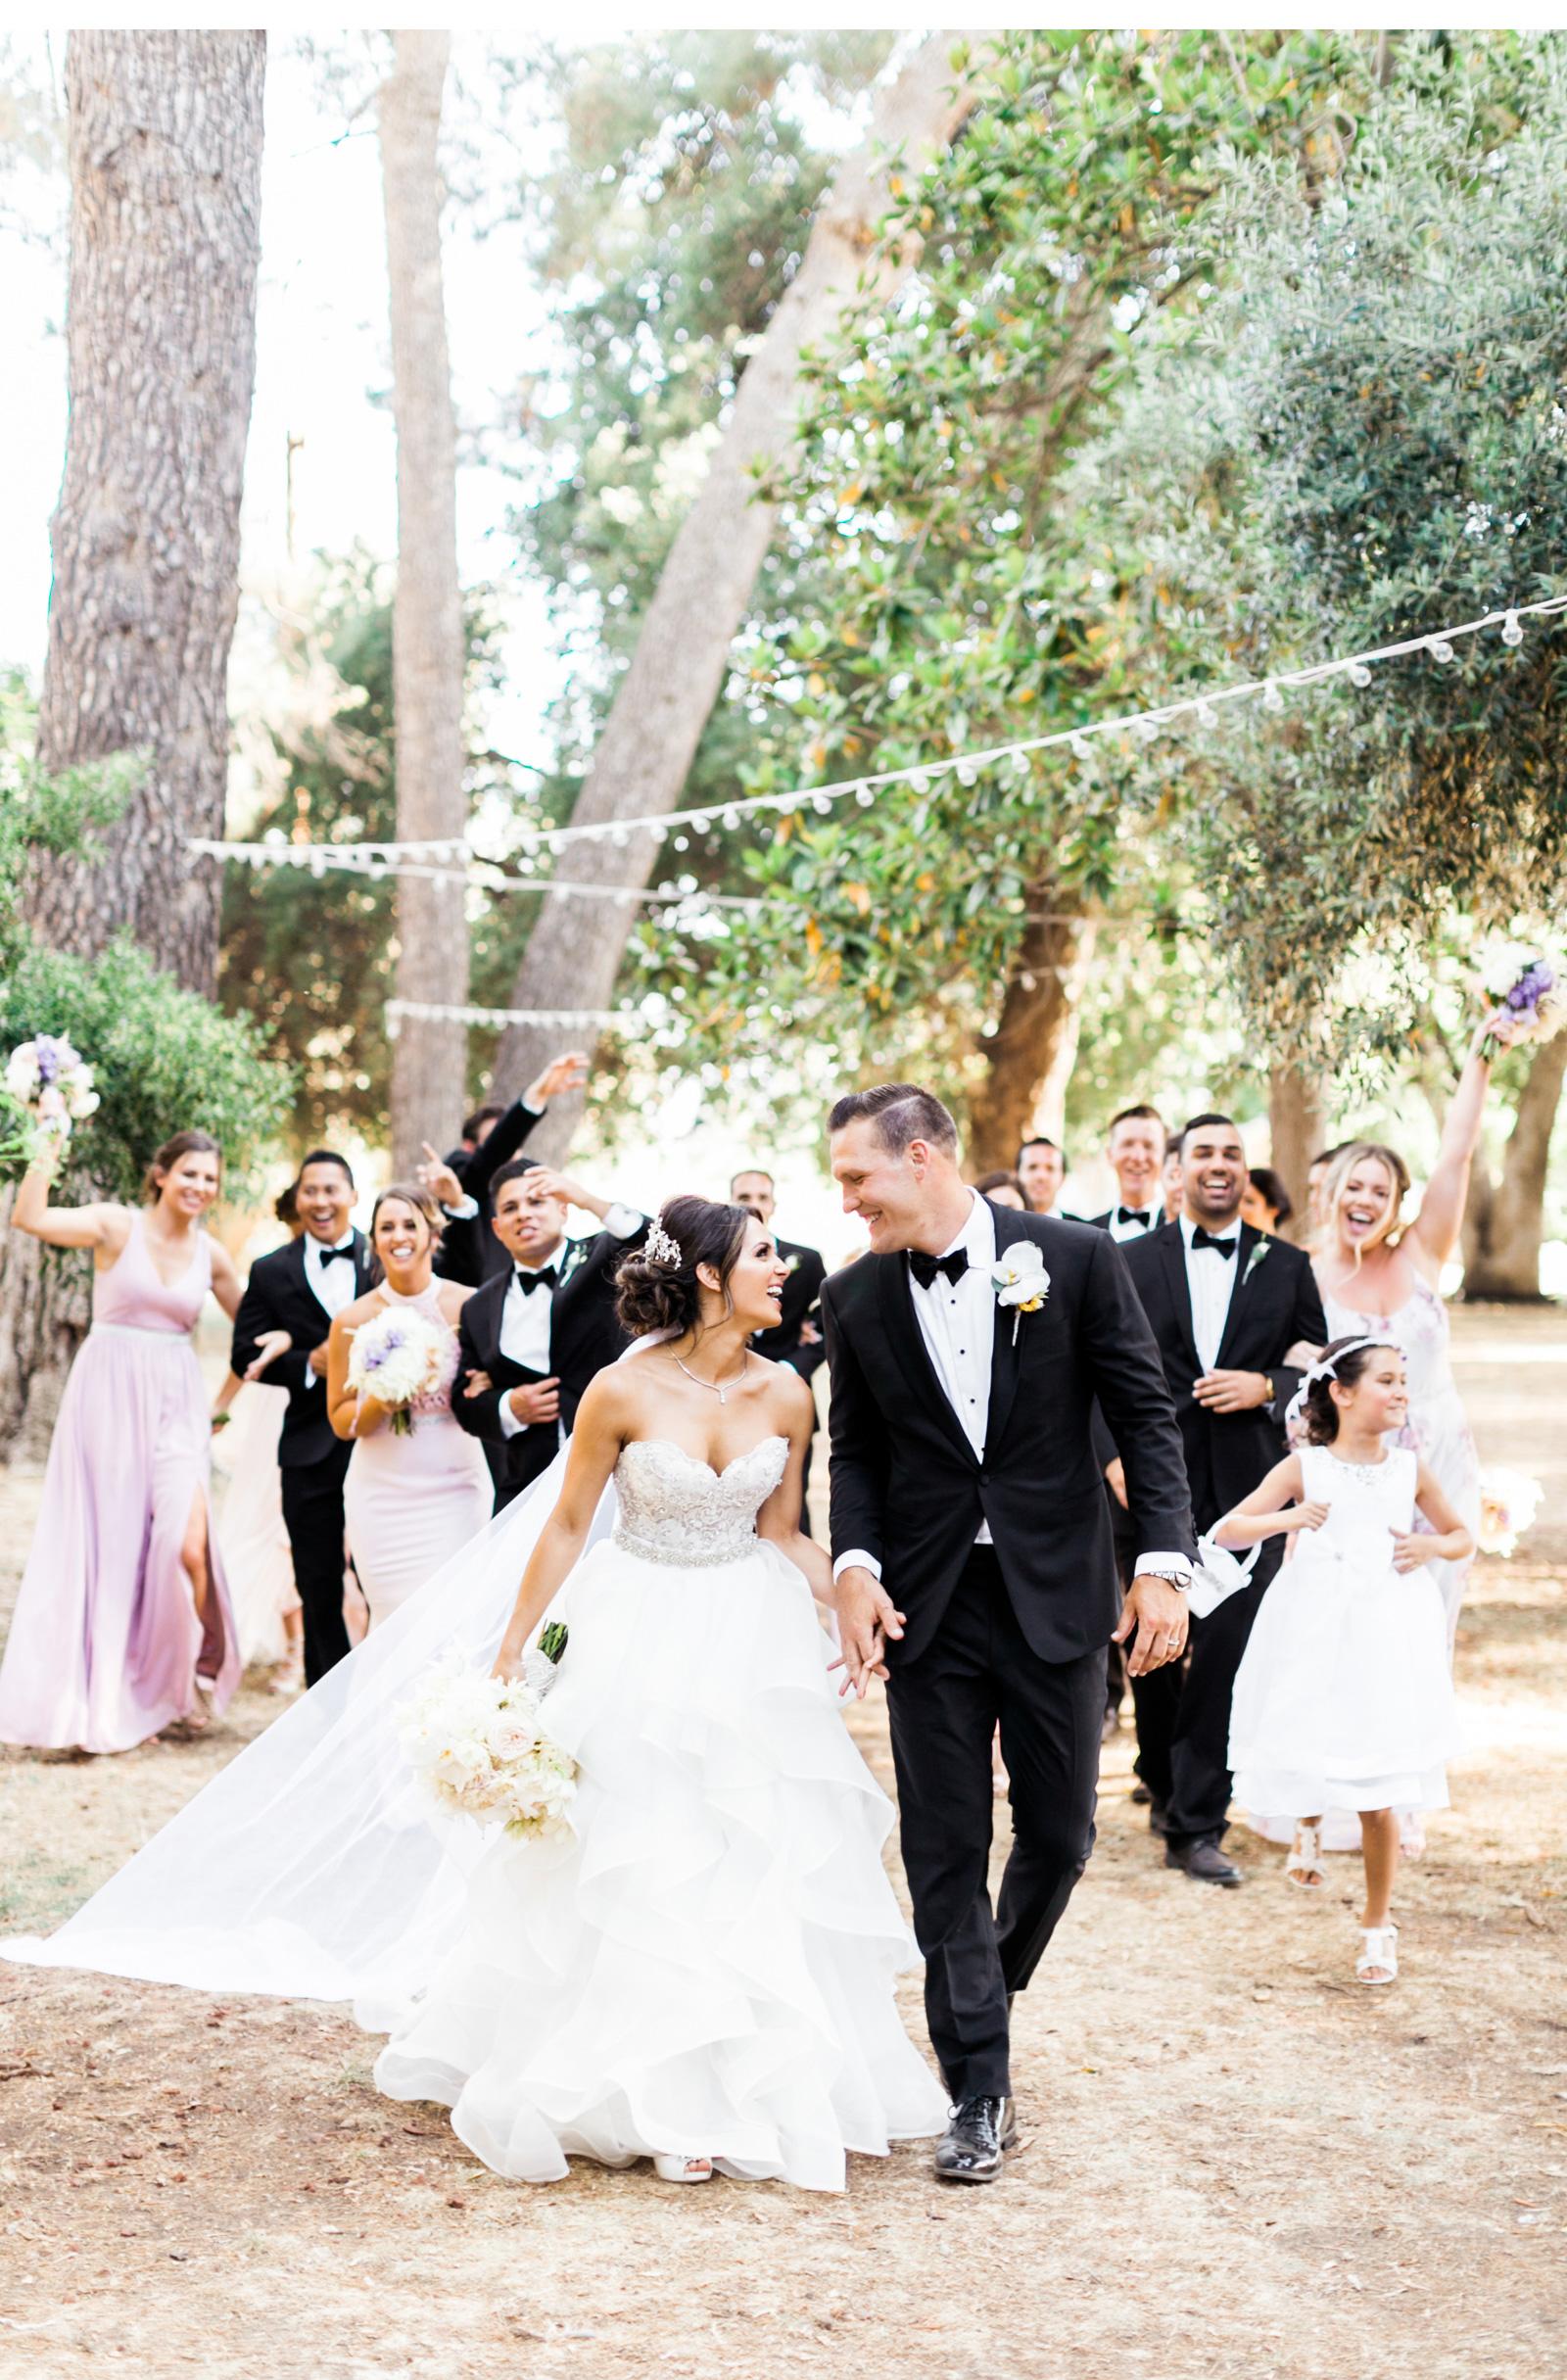 Style-Me-Pretty-Santa-Barbara-Wedding-Photographer-Natalie-Schutt-Photography_02.jpg